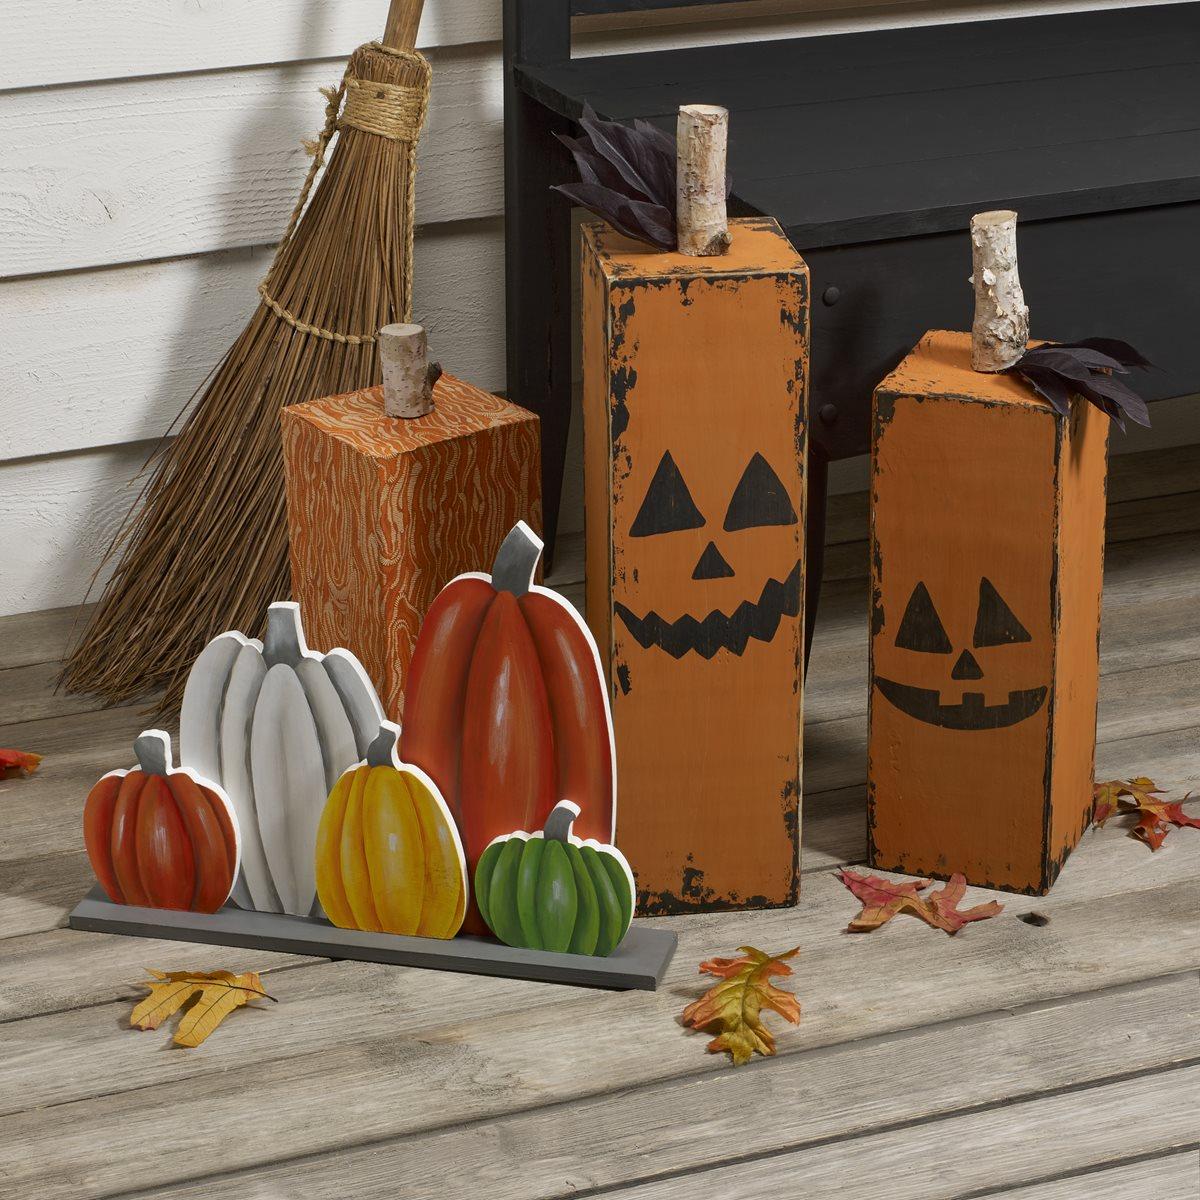 DIY Pumpkin Patch Stand